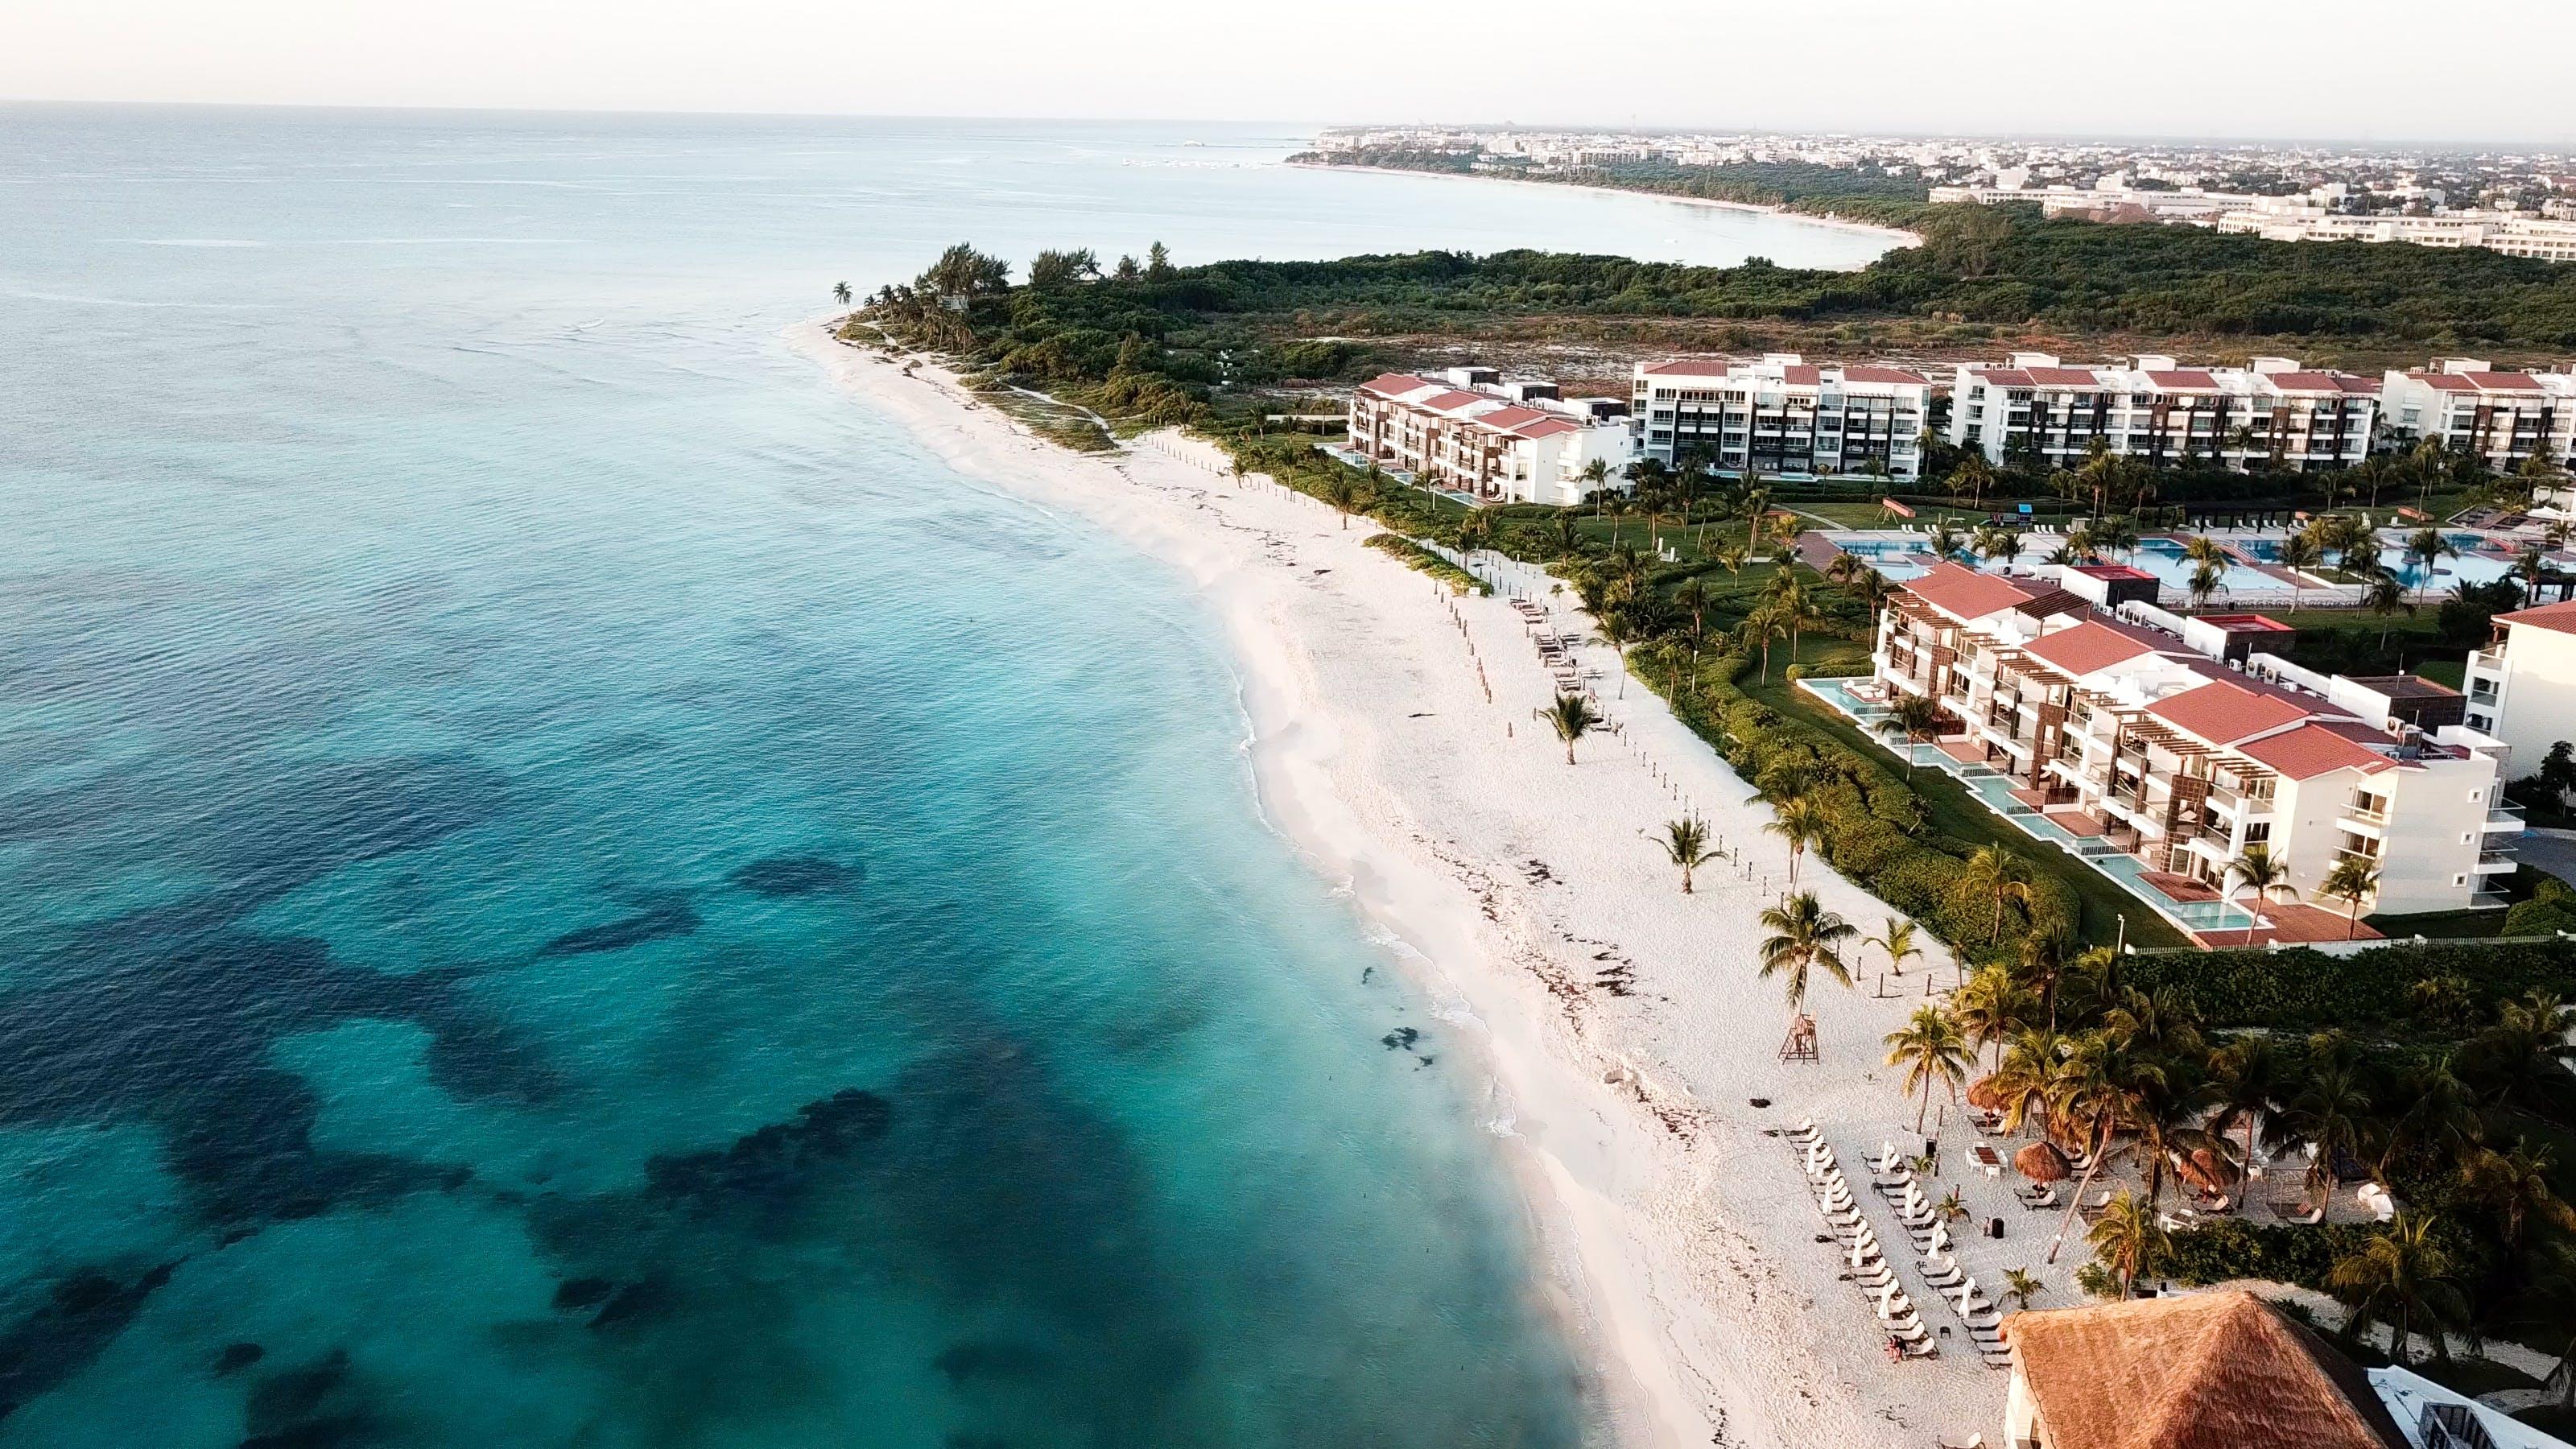 Aerial View of White Sand Beach